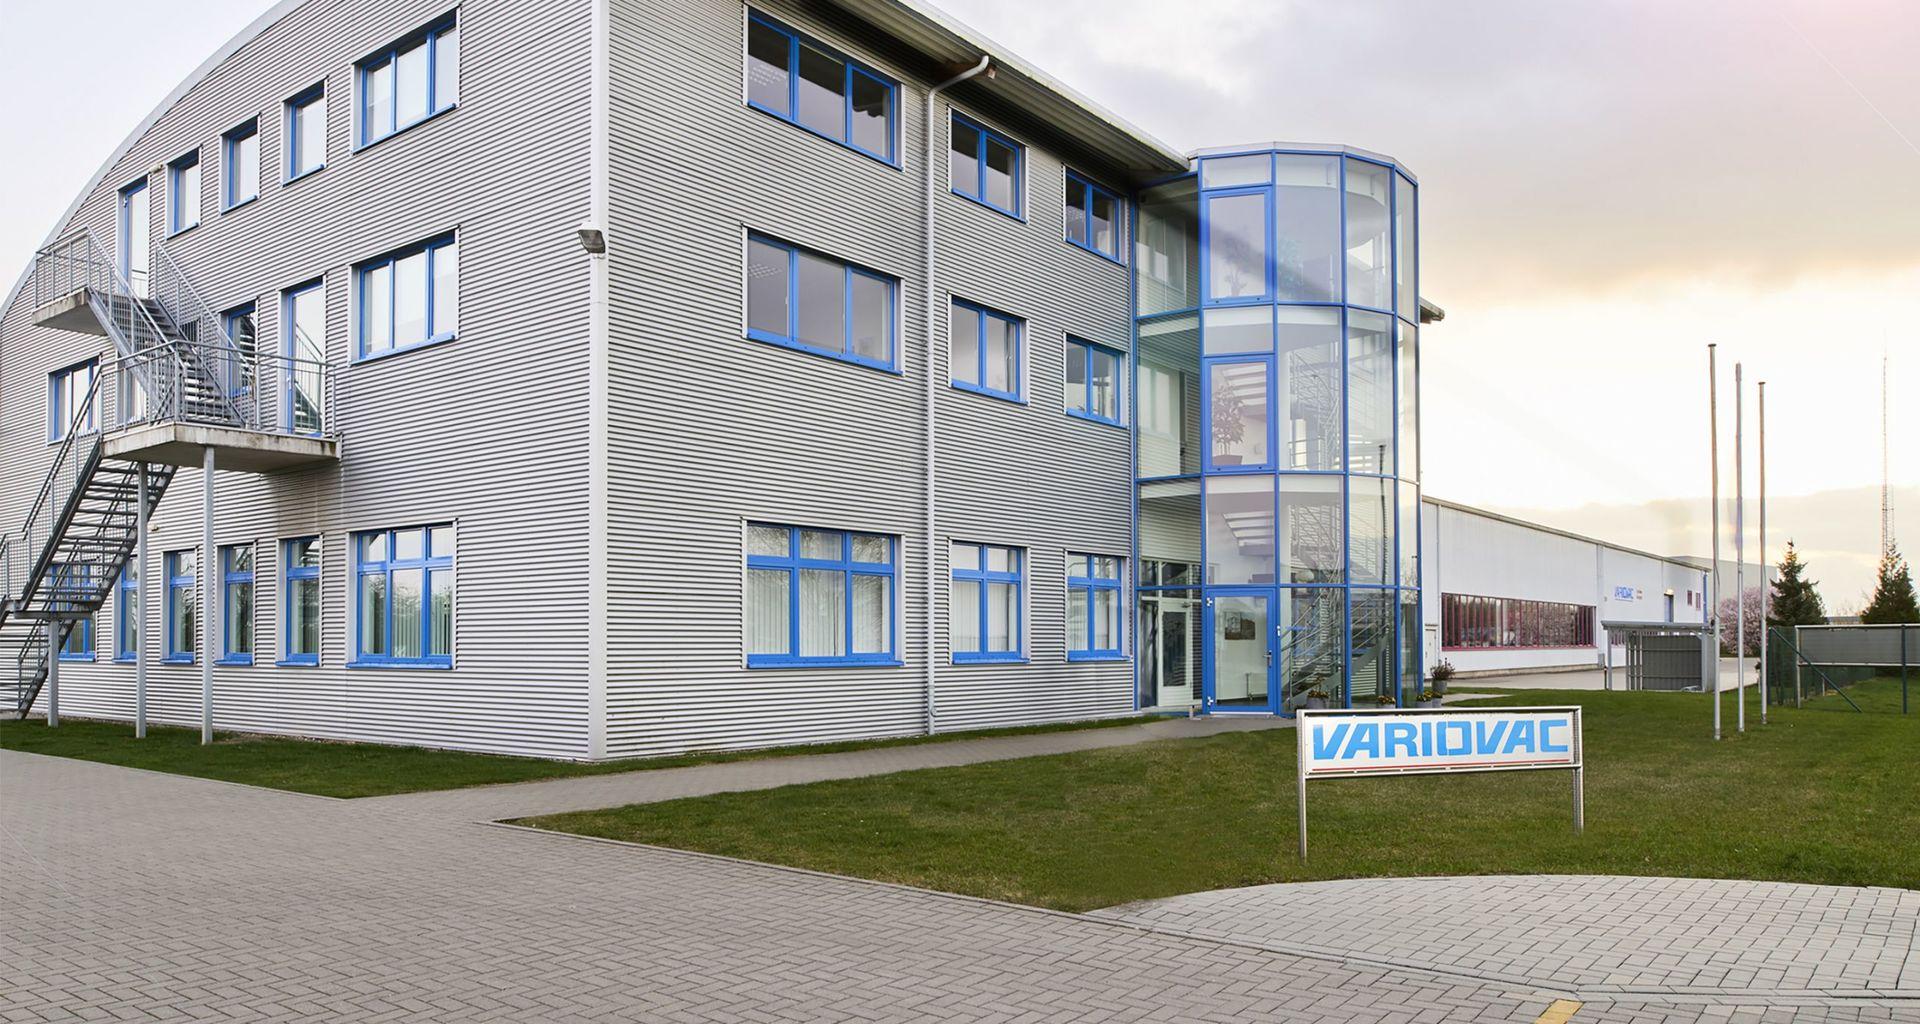 VARIOVAC Firmensitz in Zarrentin am Schaalsee